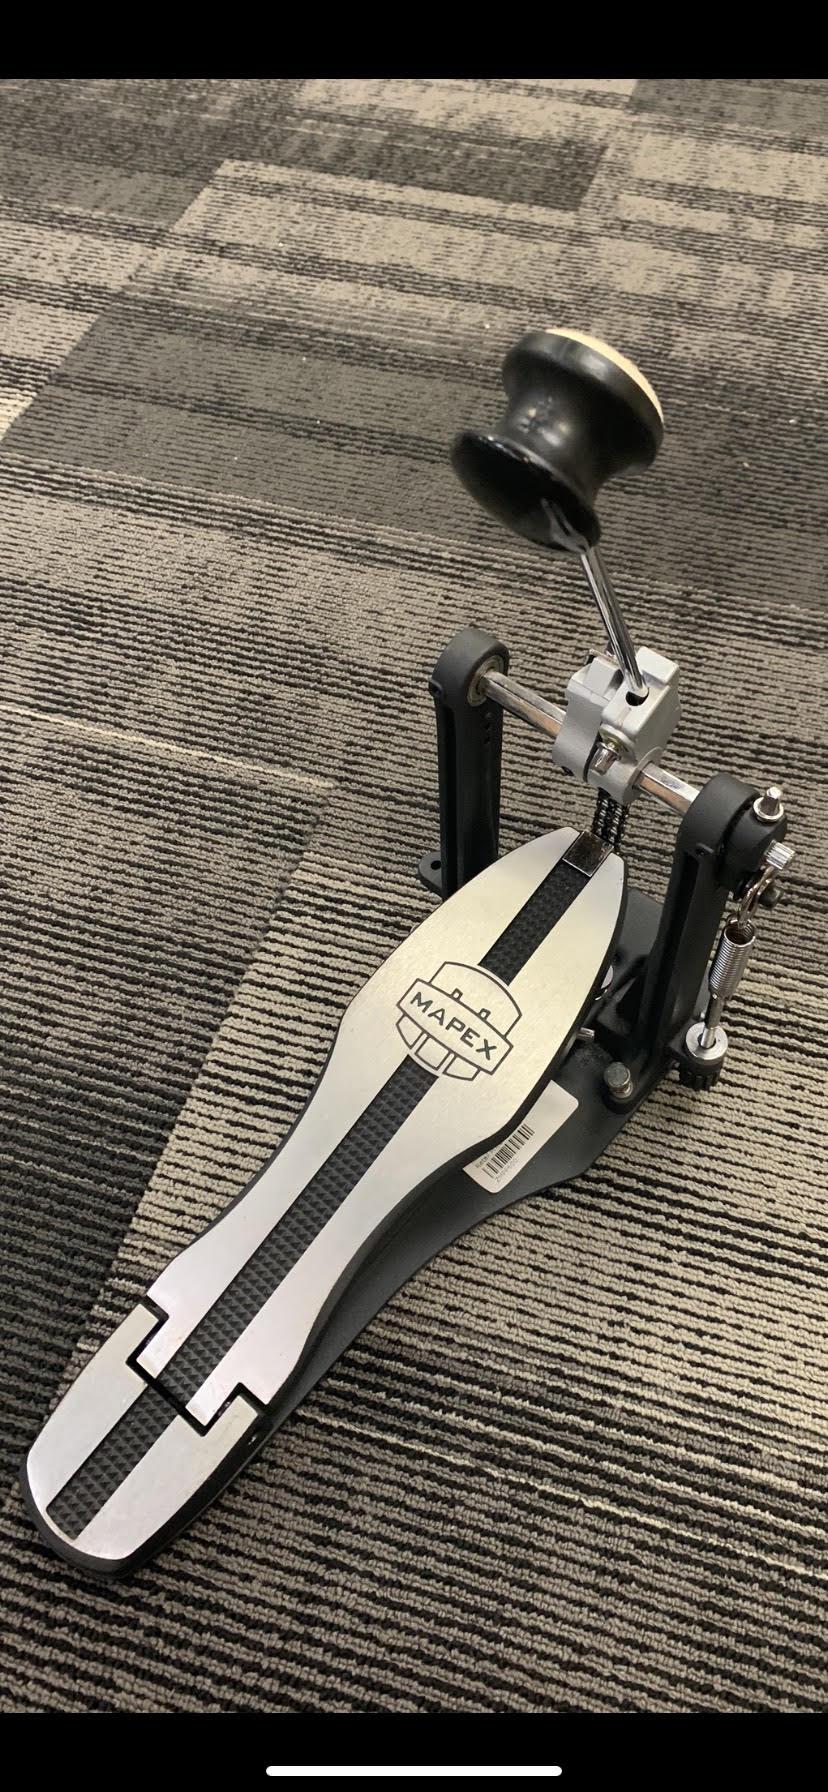 Used Mapex Mars Single Bass Pedal